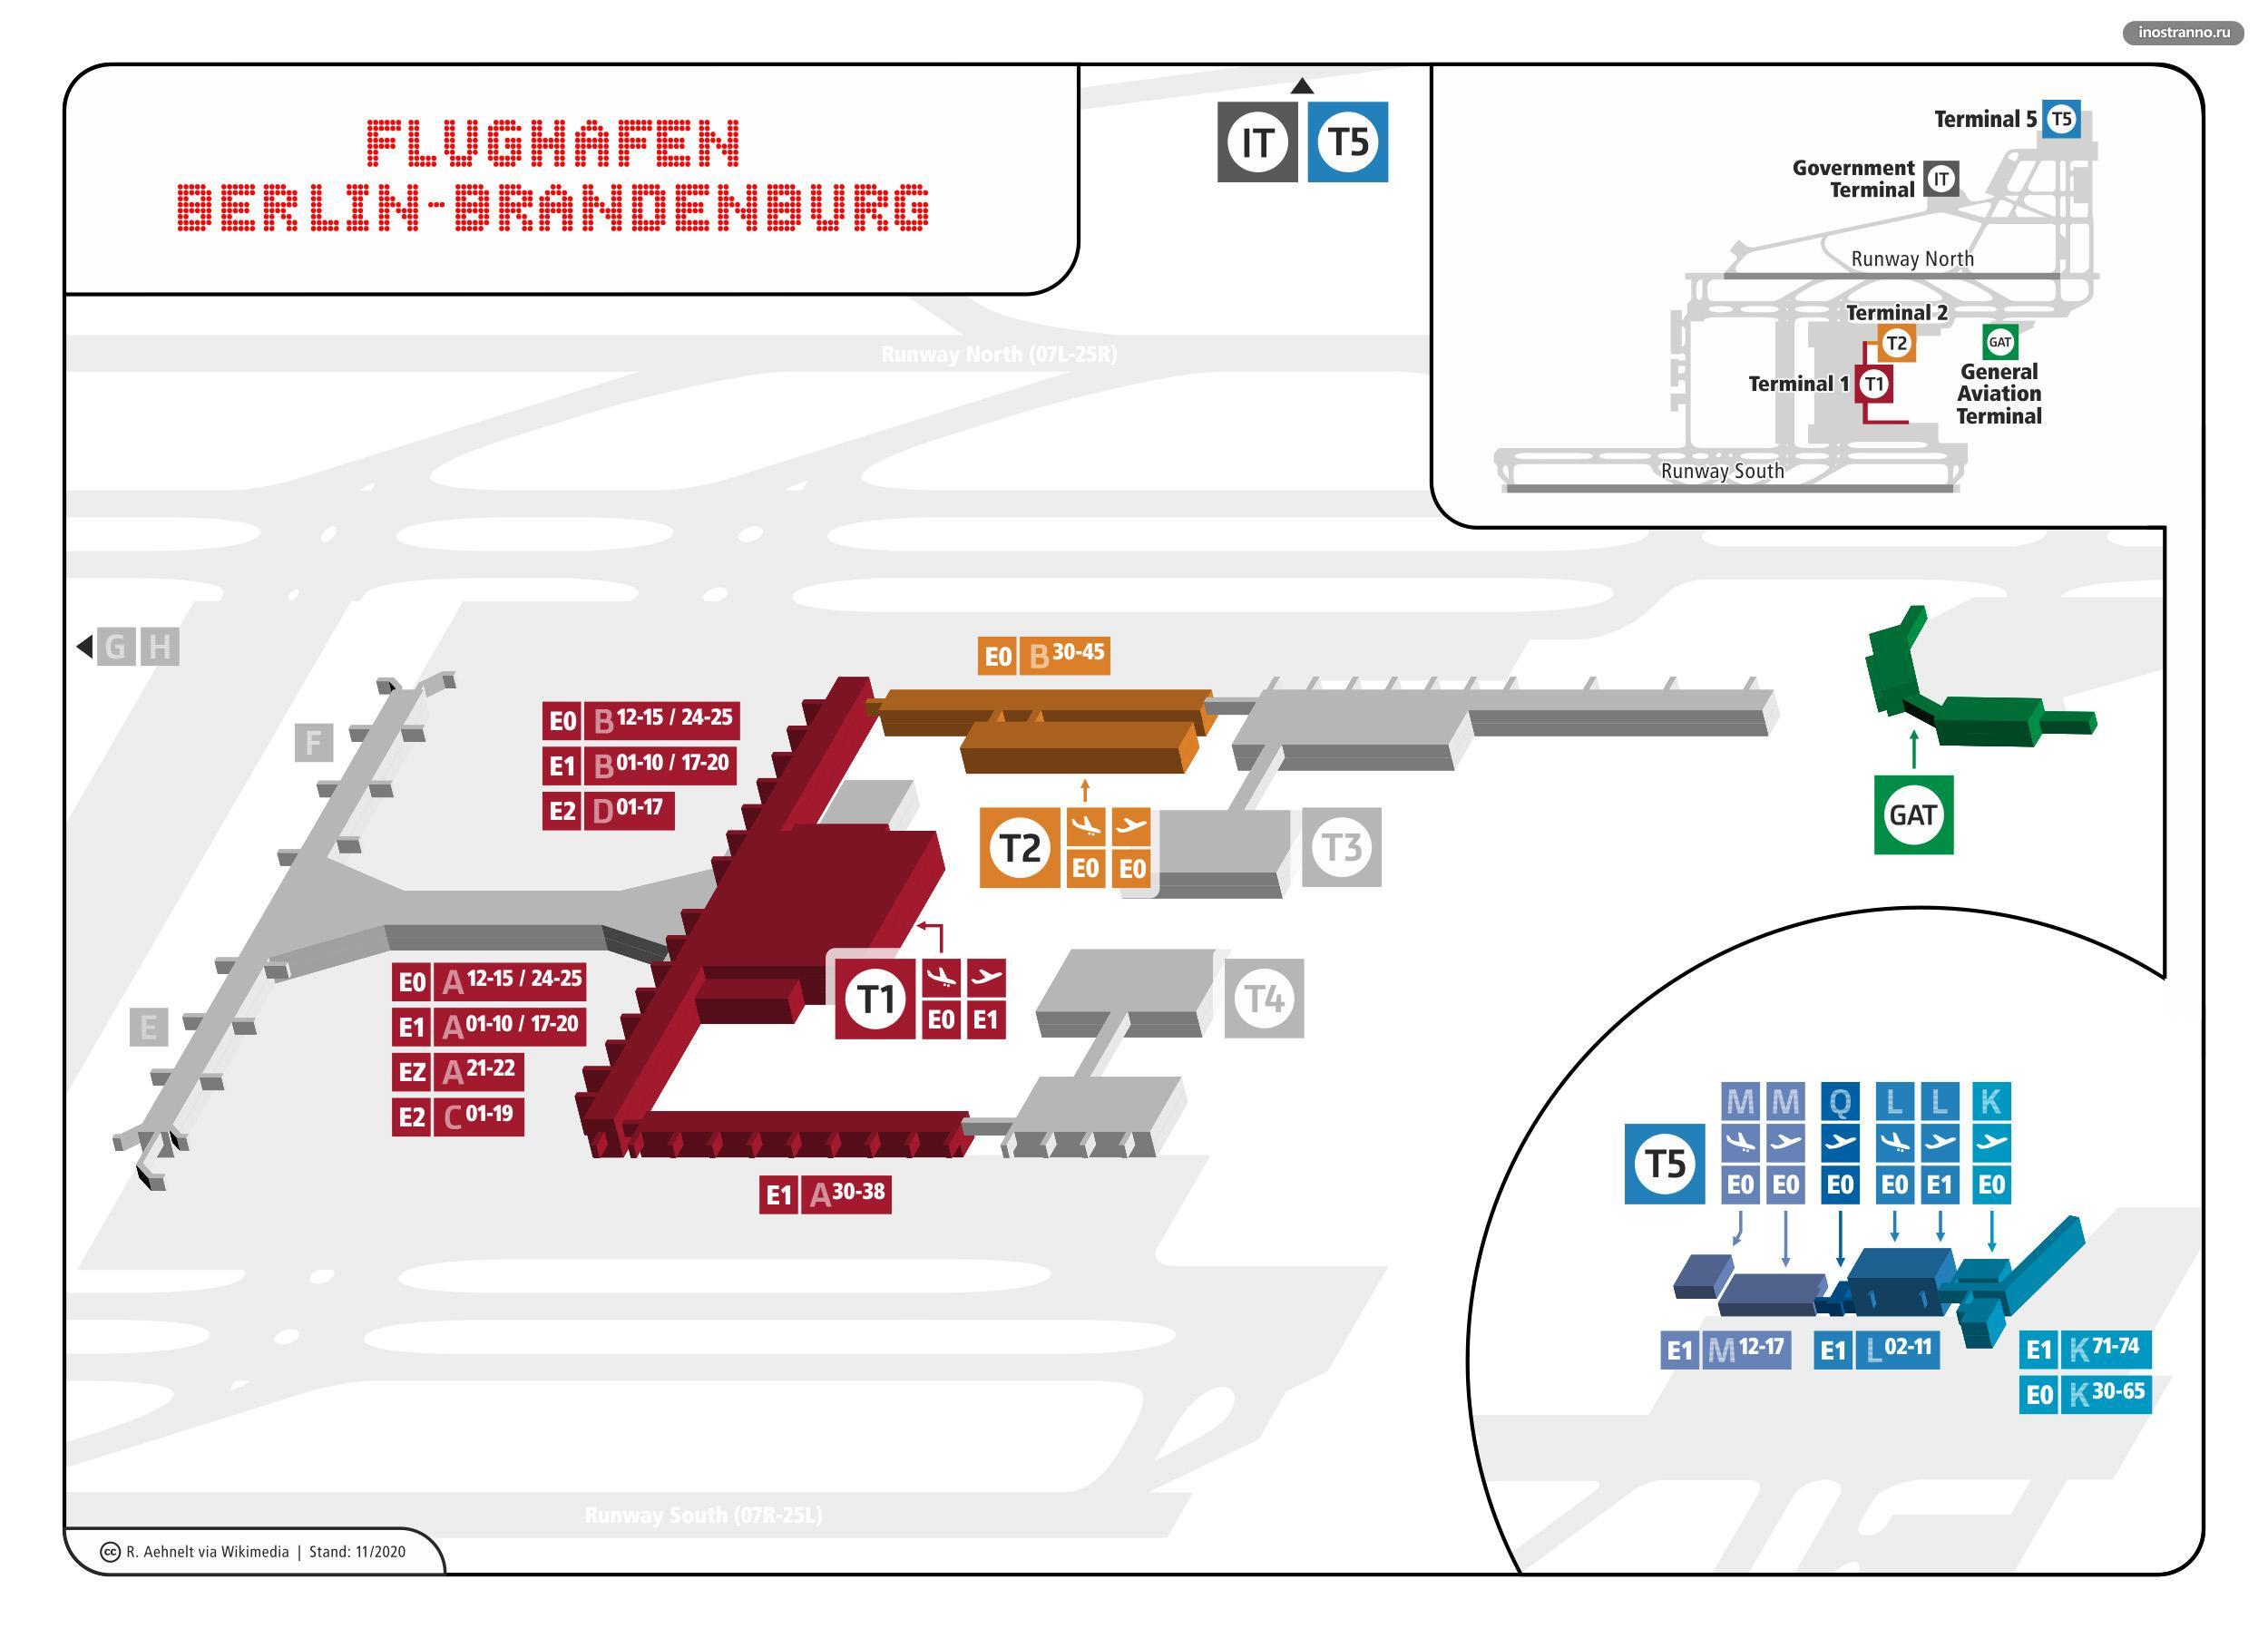 Новый аэропорт Берлин-Бранденбург карта схема